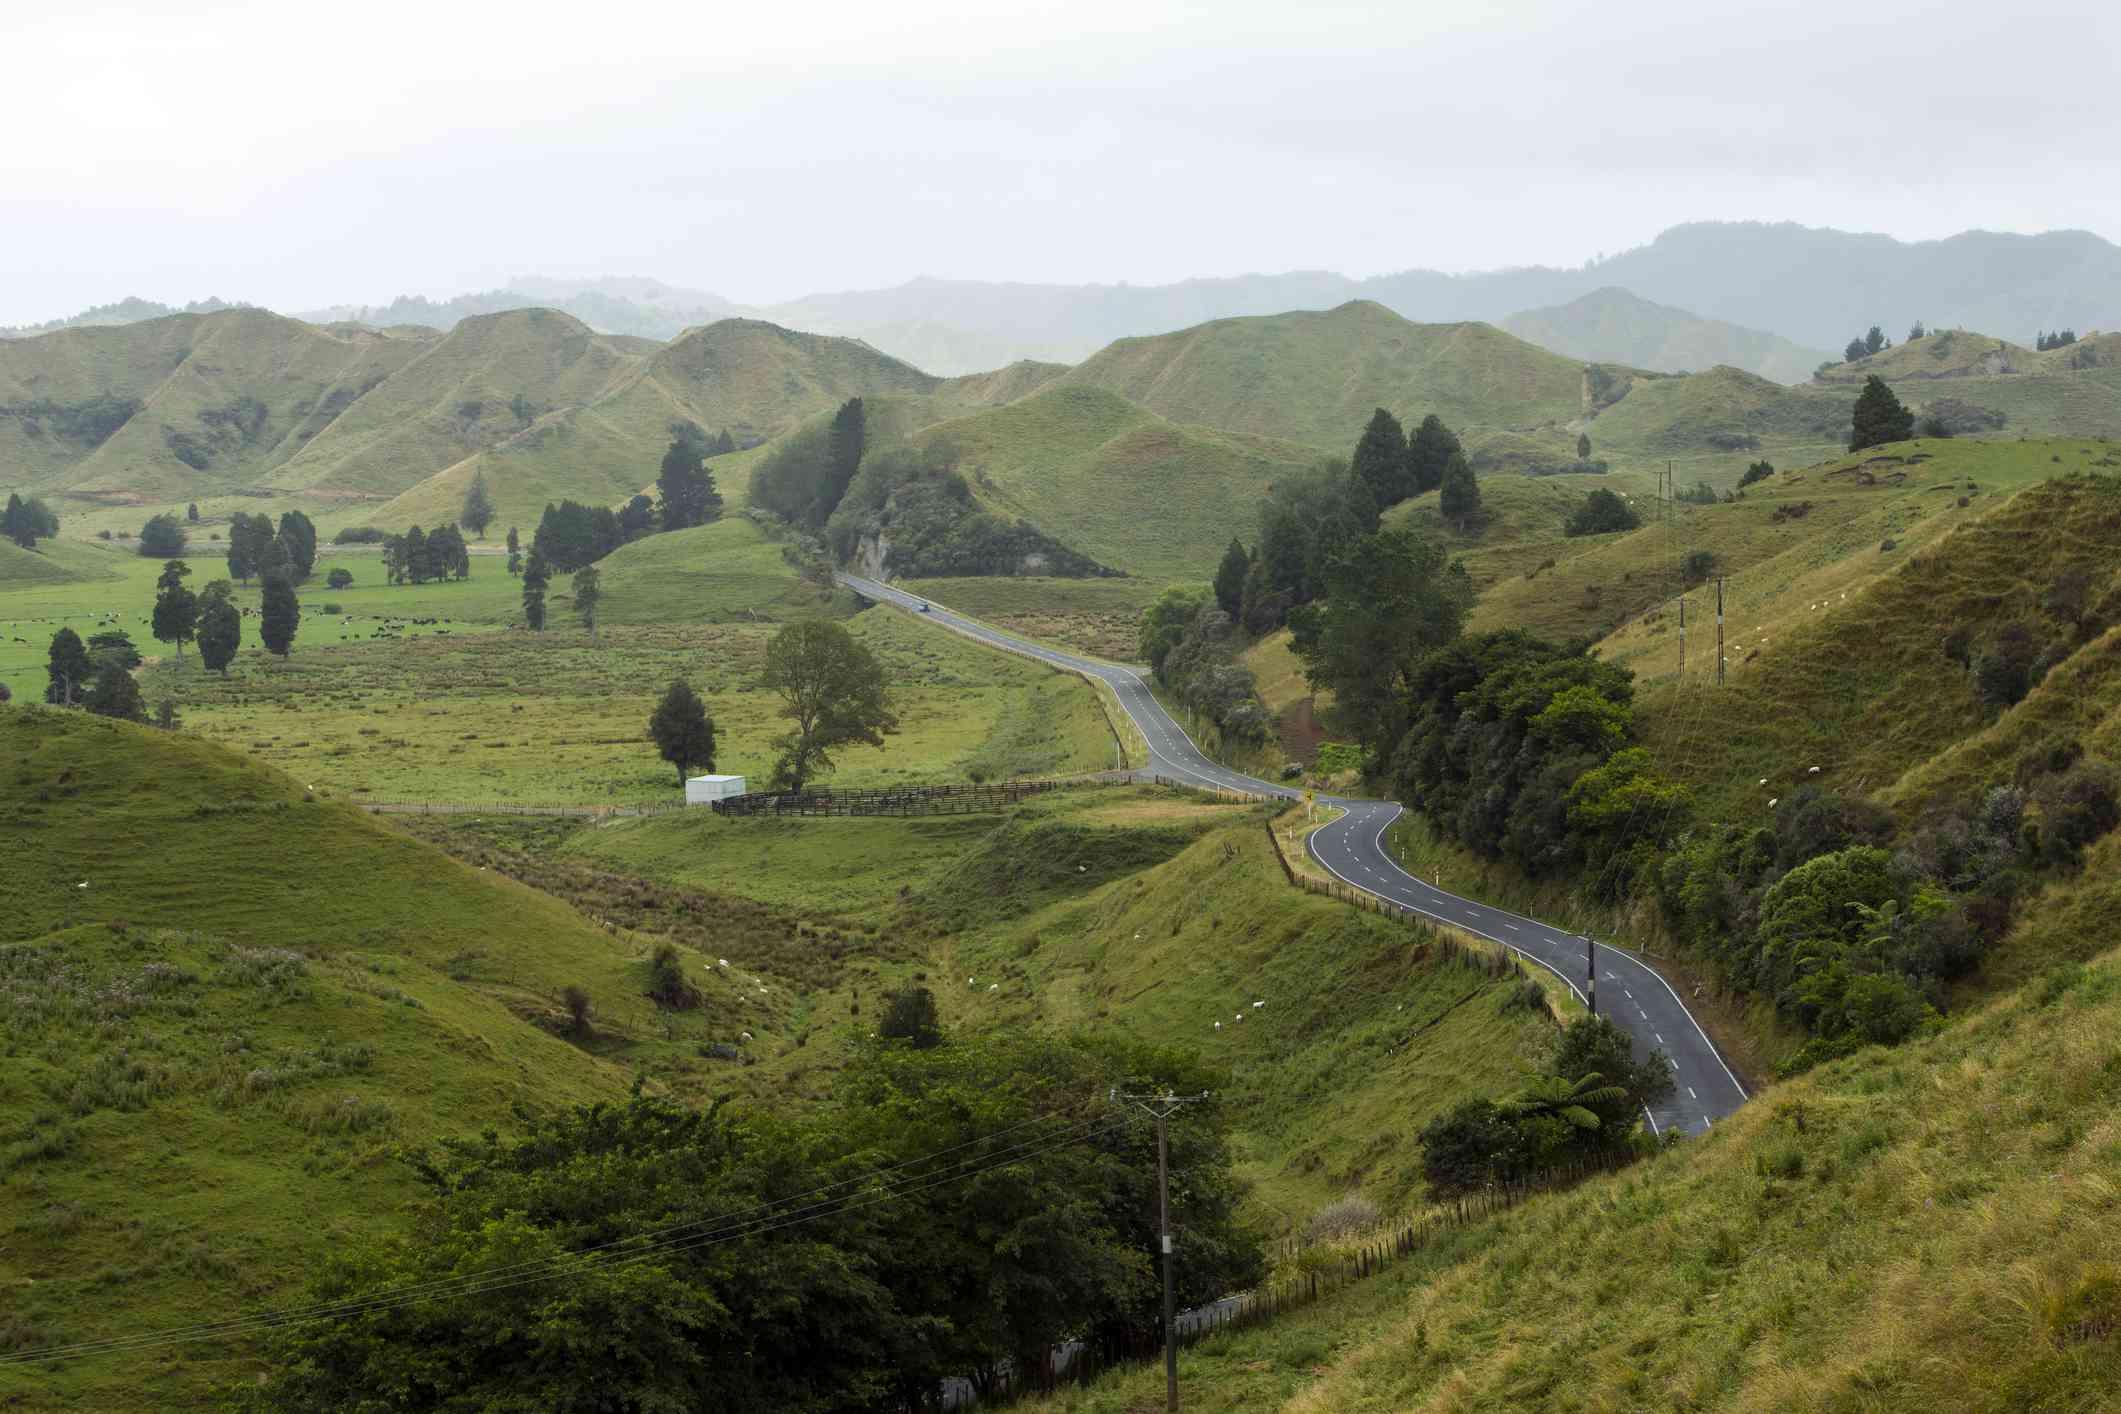 road winding through steep green hills